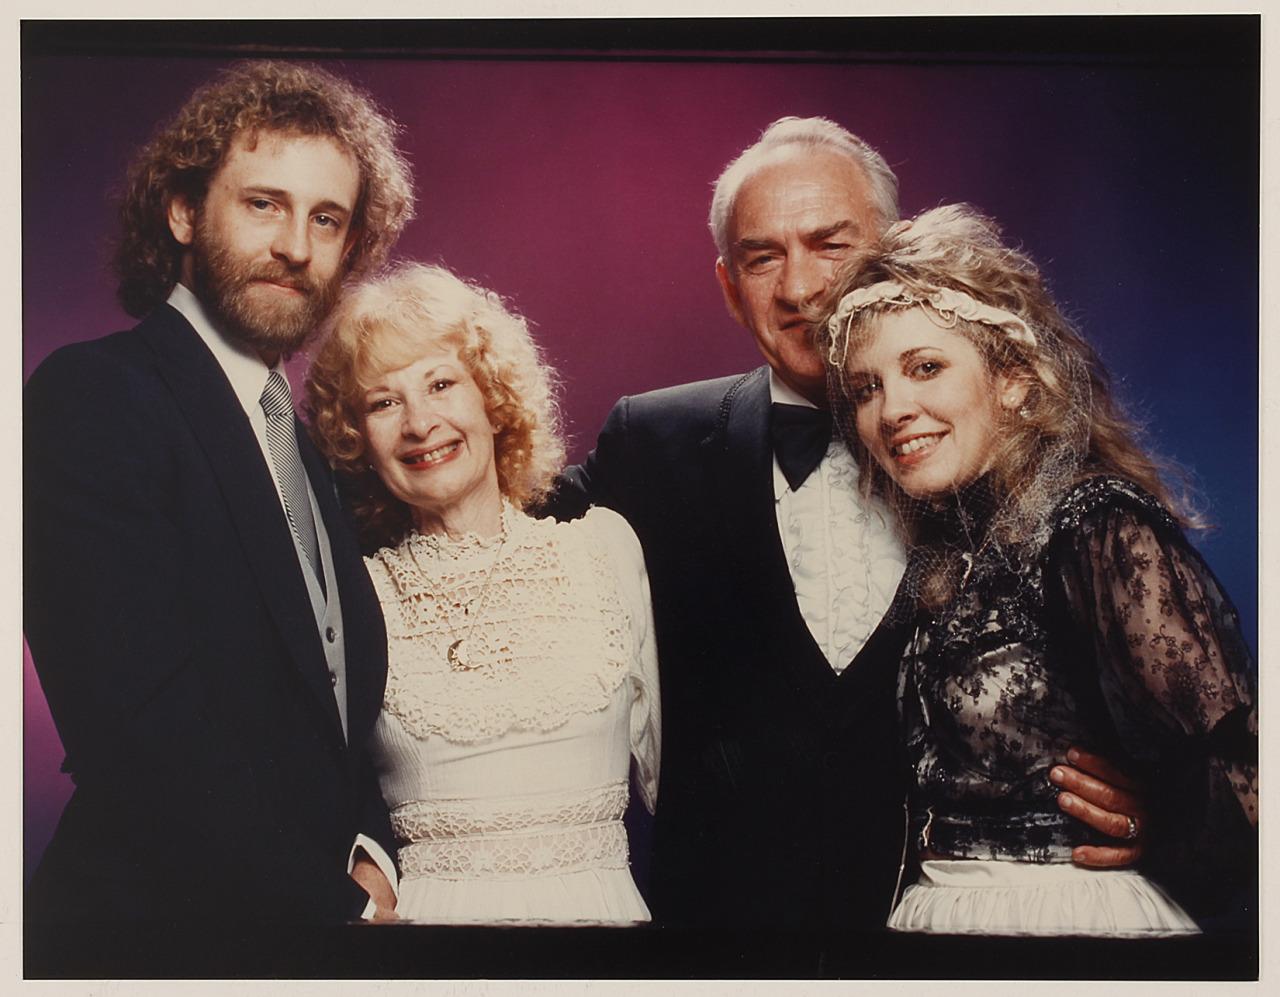 Stevie Nicks Family Photo